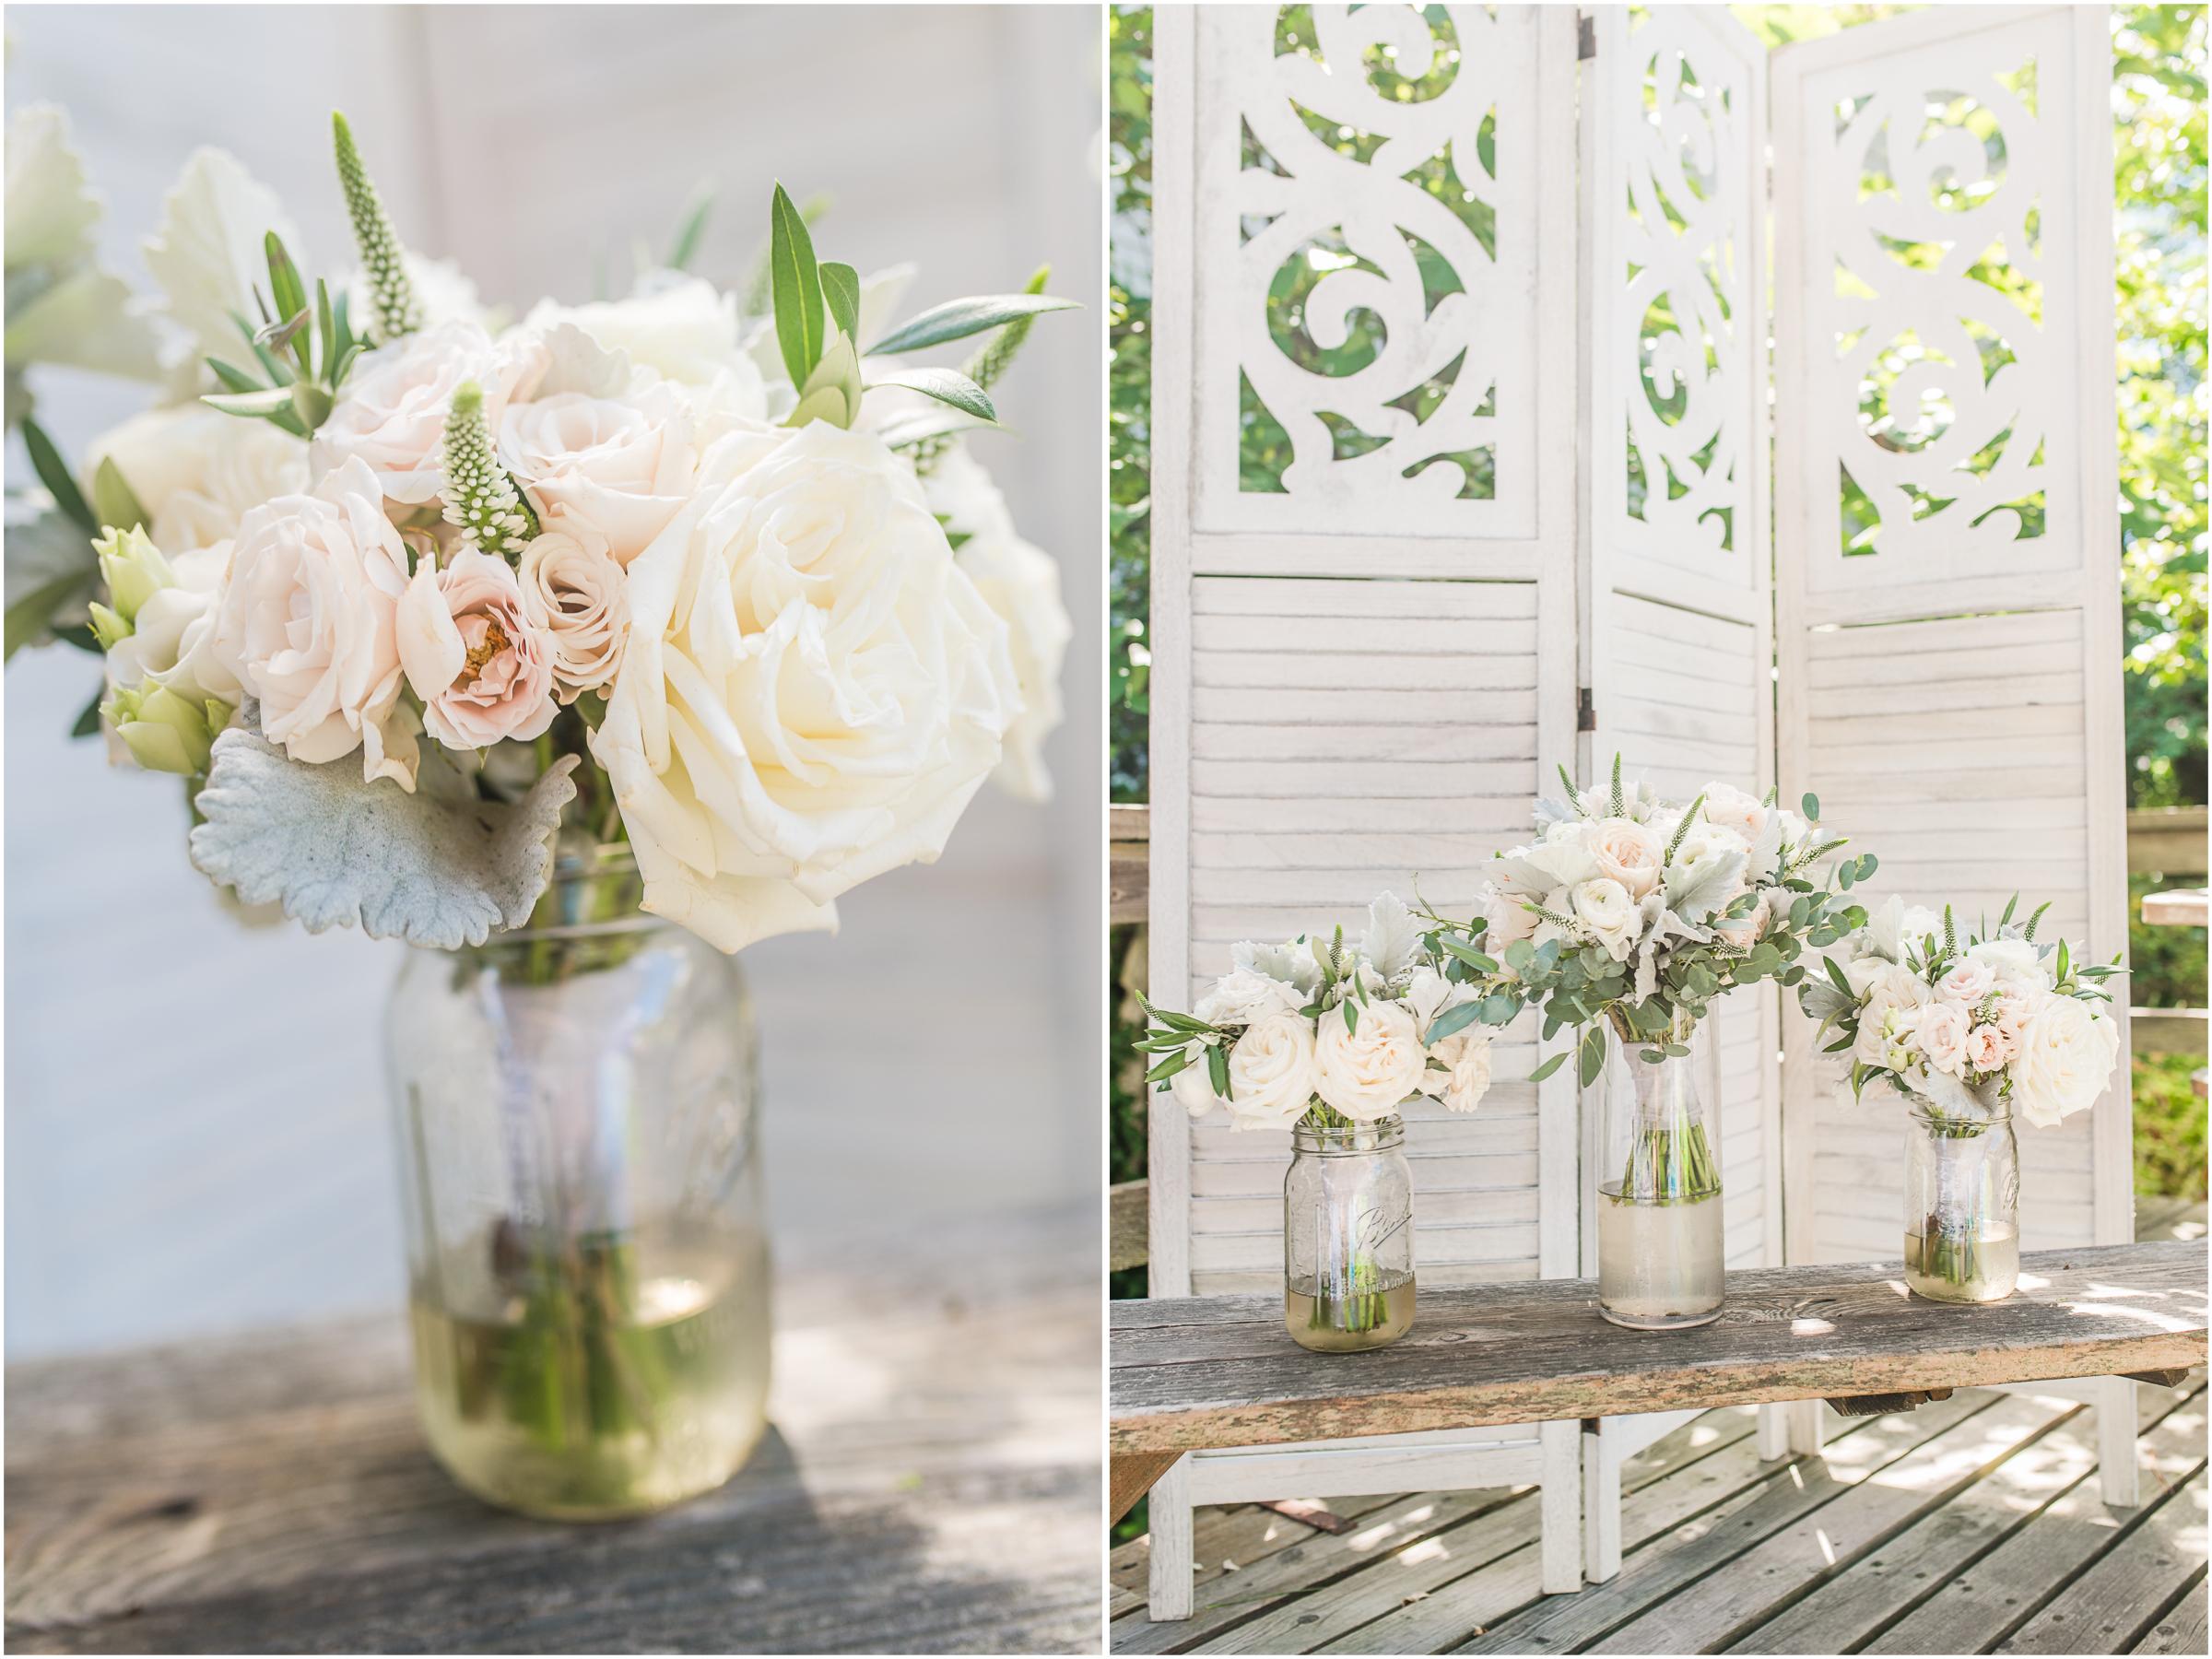 lbi-wedding-arts-foundation-lbi-wedding-photographer-5.jpg